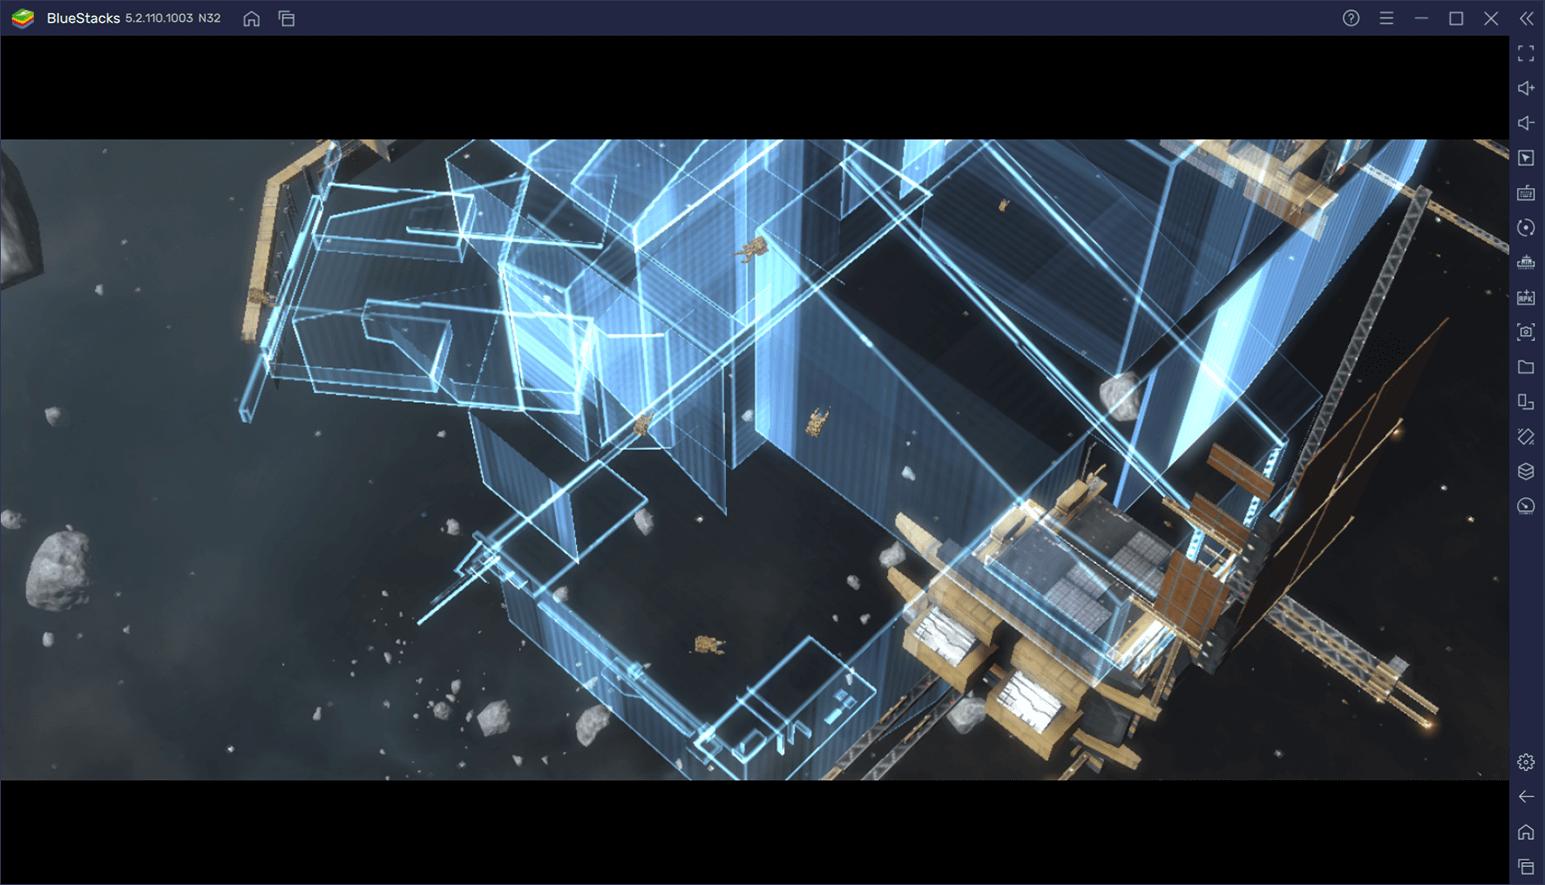 BlueStacksを使ってPCで『インフィニット ラグランジュ』を遊ぼう